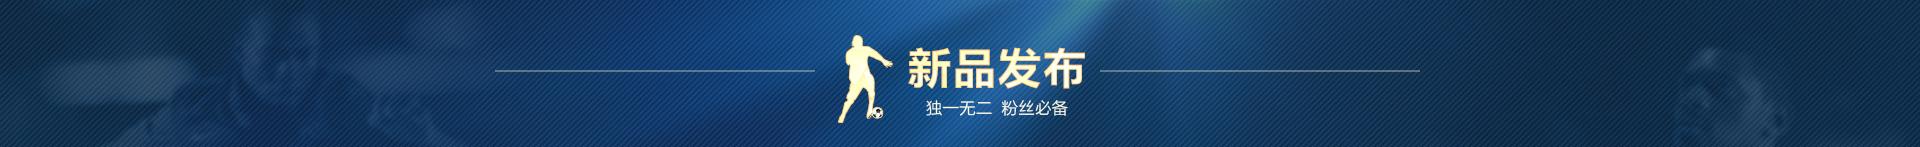 http://image.suning.cn/uimg/sop/commodity/499509371404906635793900_x.jpg